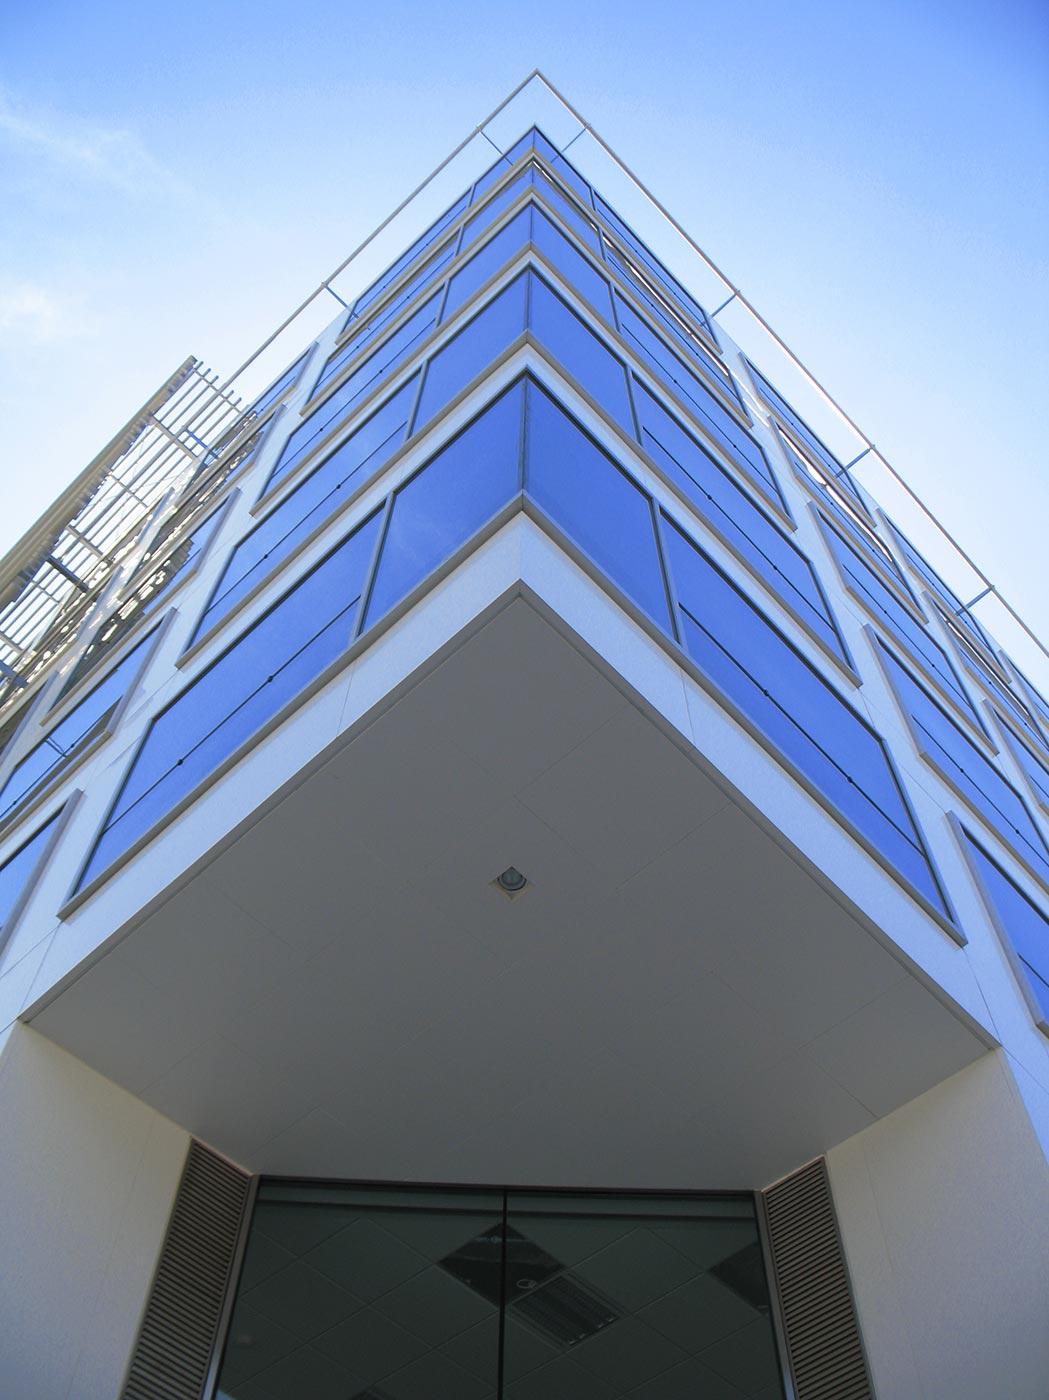 Edificio-Dique-IV.-Buenos-Aires-Argentina-CGSA-Larson-PE-PVDF-ral-9016-2500m2-ult1--1_1592296372.jpg